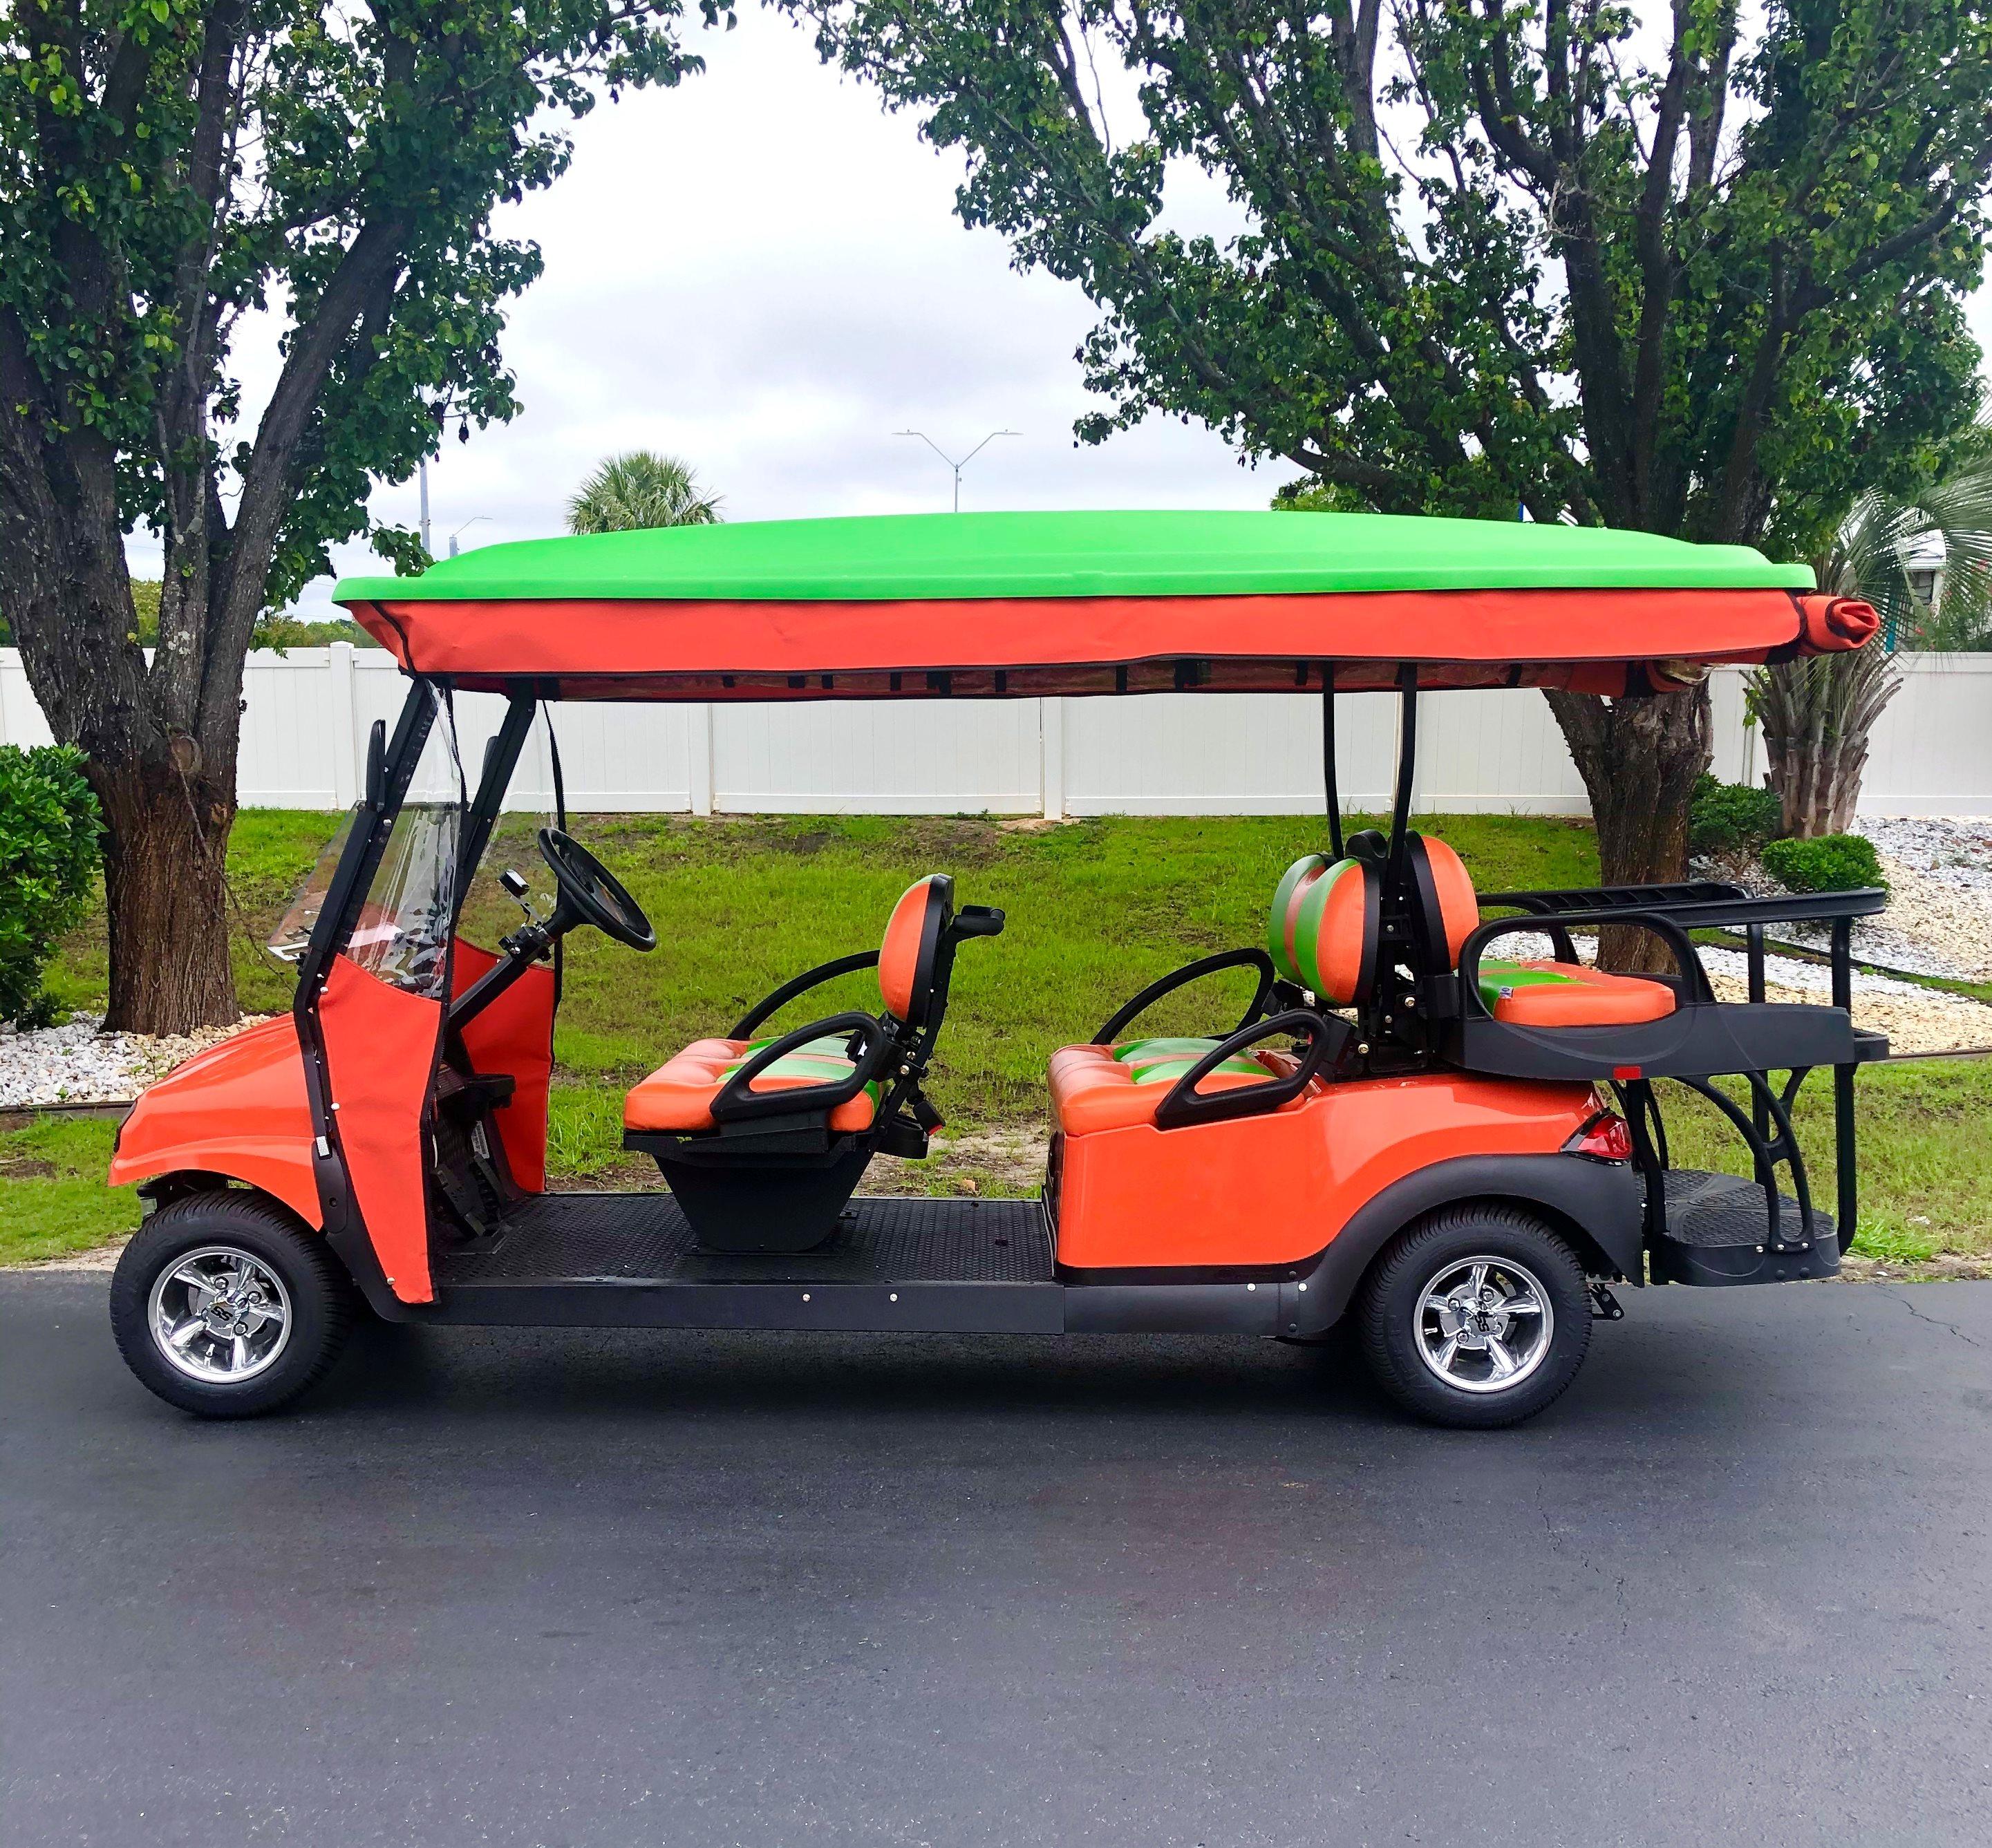 2020 Club Car 6 Passenger with Enclosure